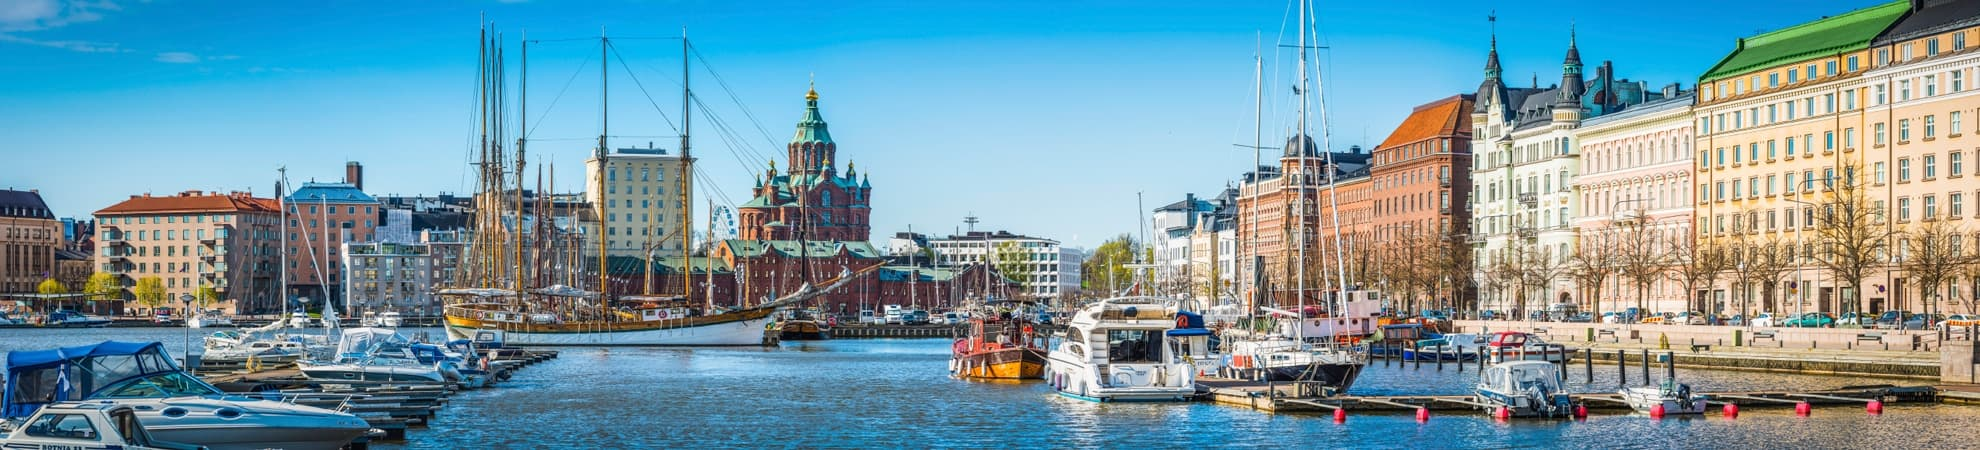 Sejour Finlande